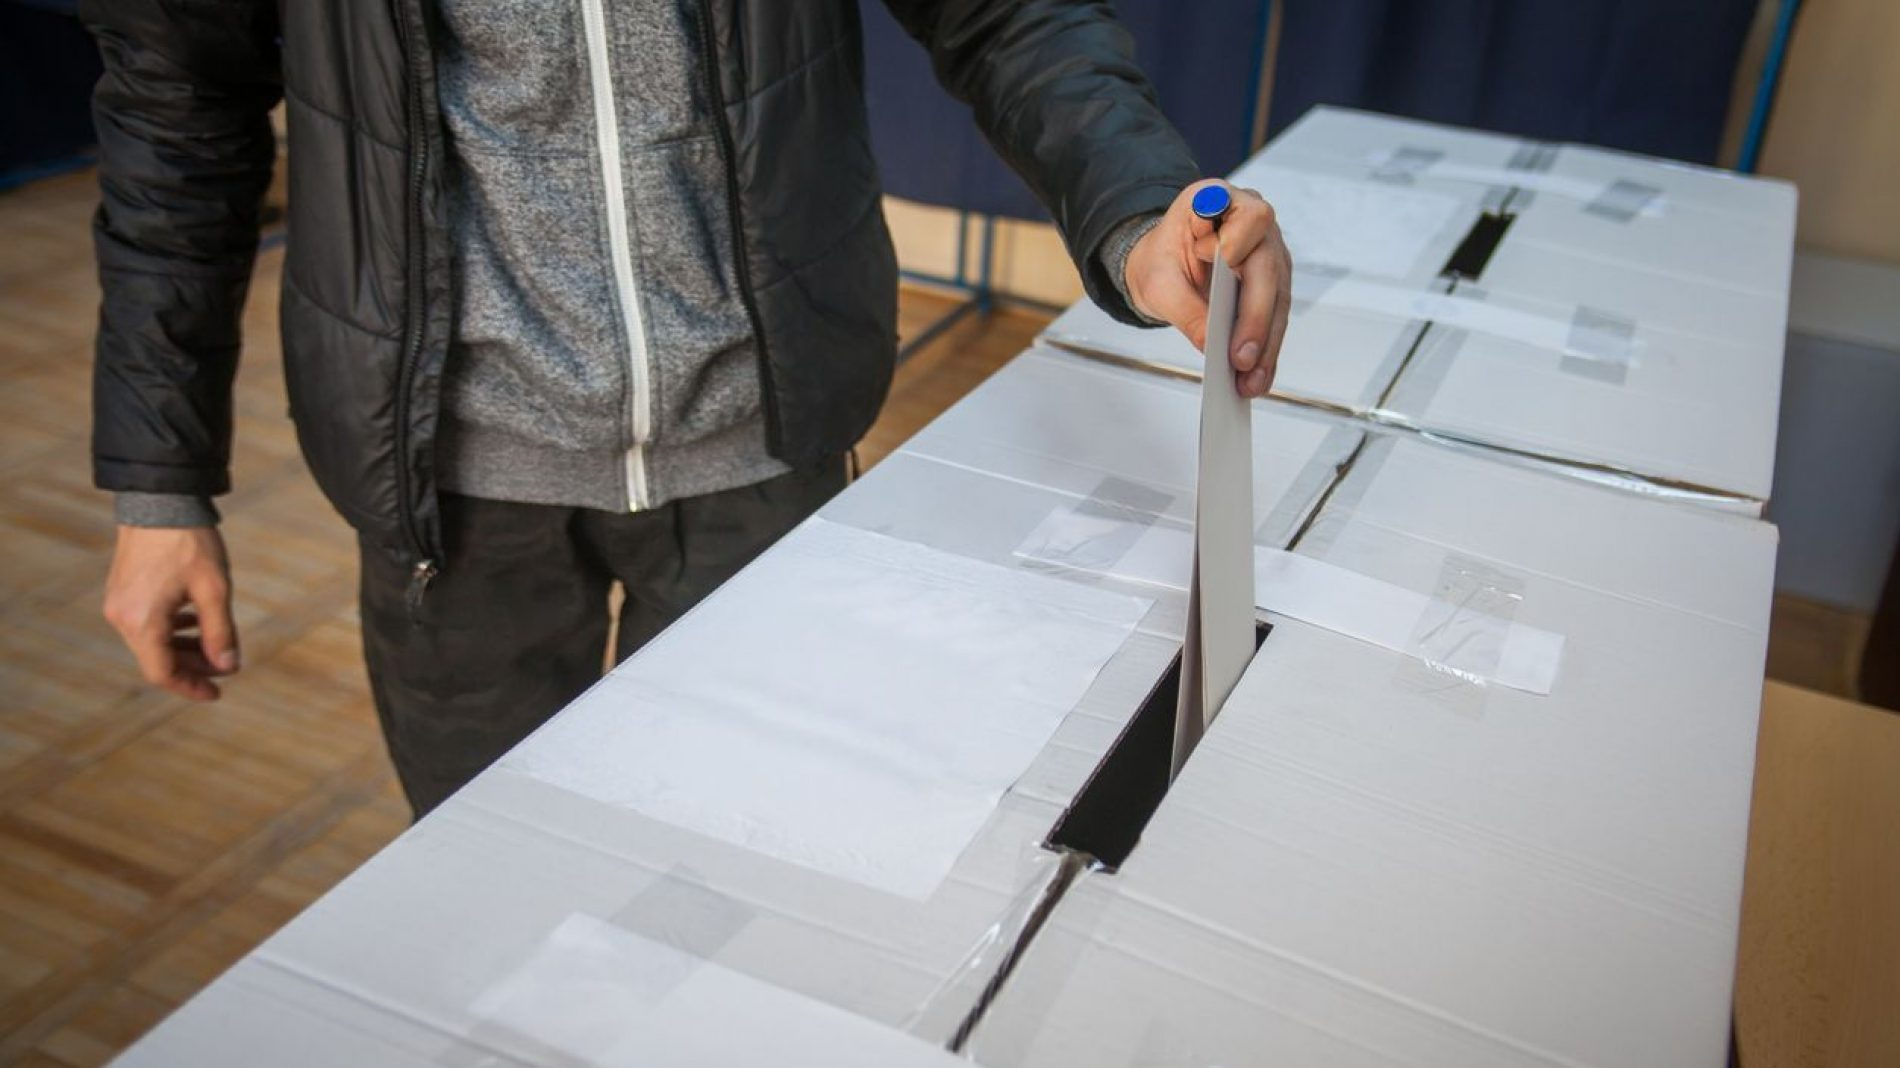 Placing a vote in a ballot box